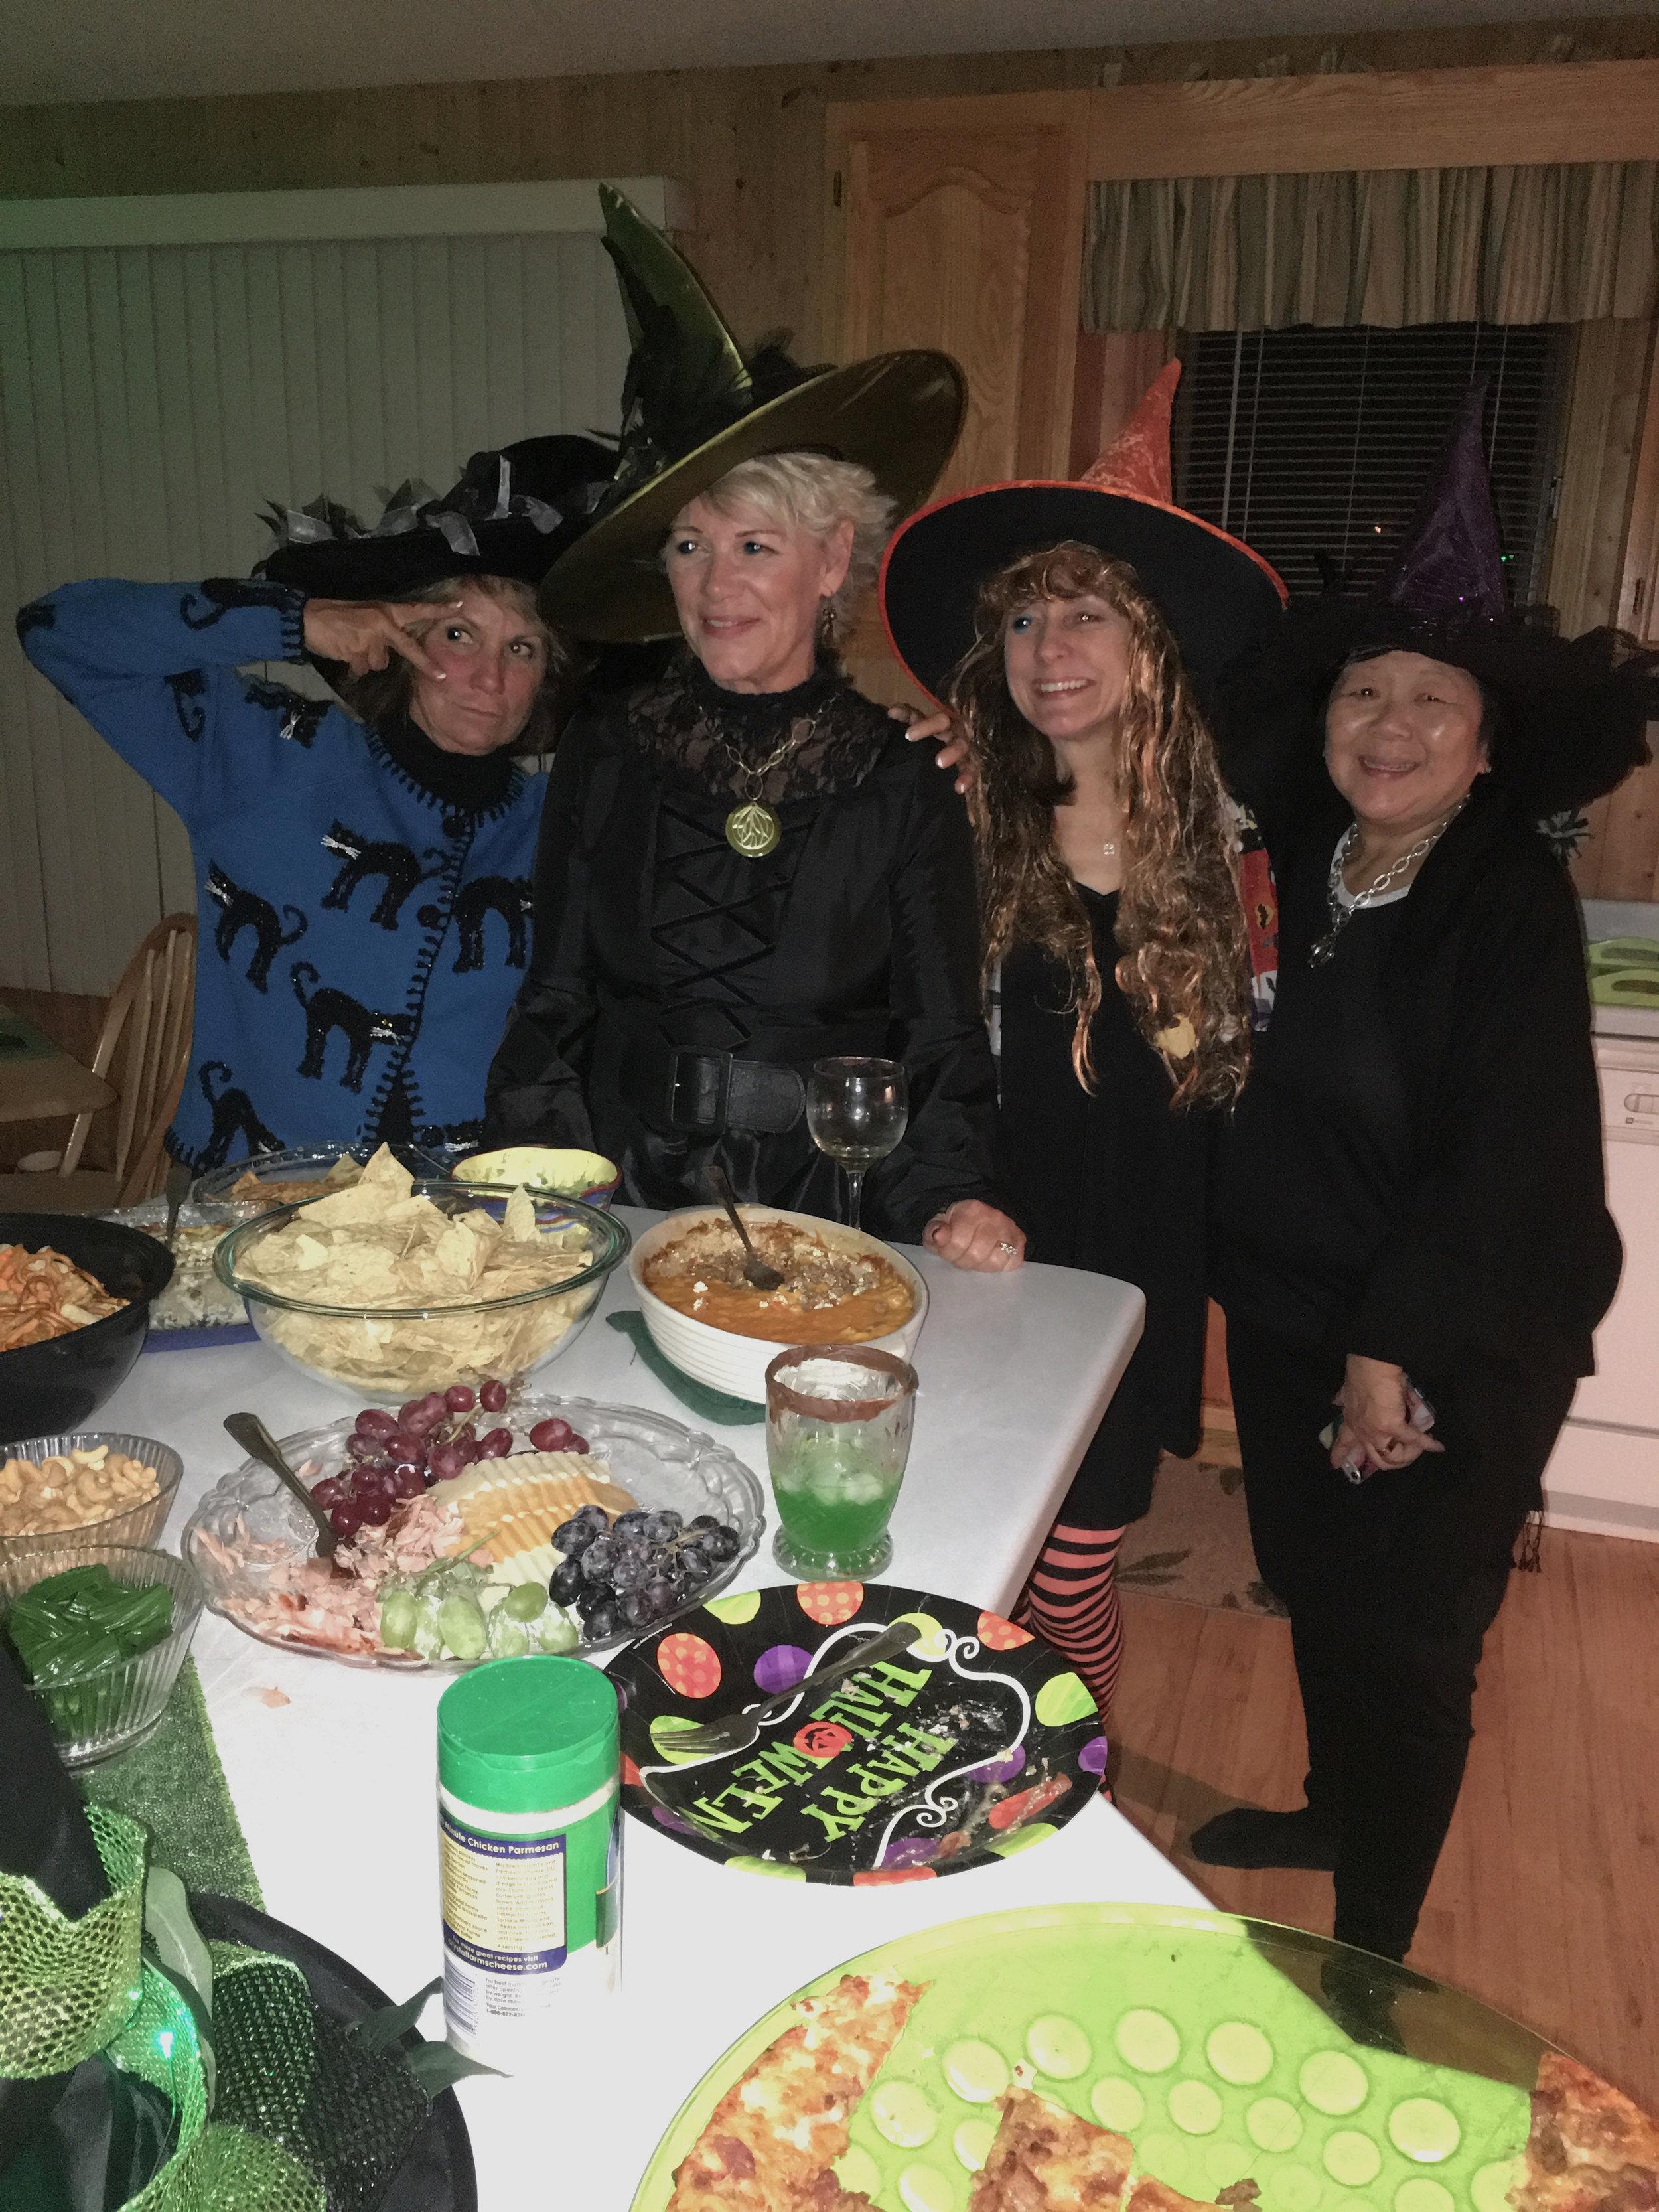 teri_w3bookclub_Wicked_halloween_spiritedtable_photo06.jpg